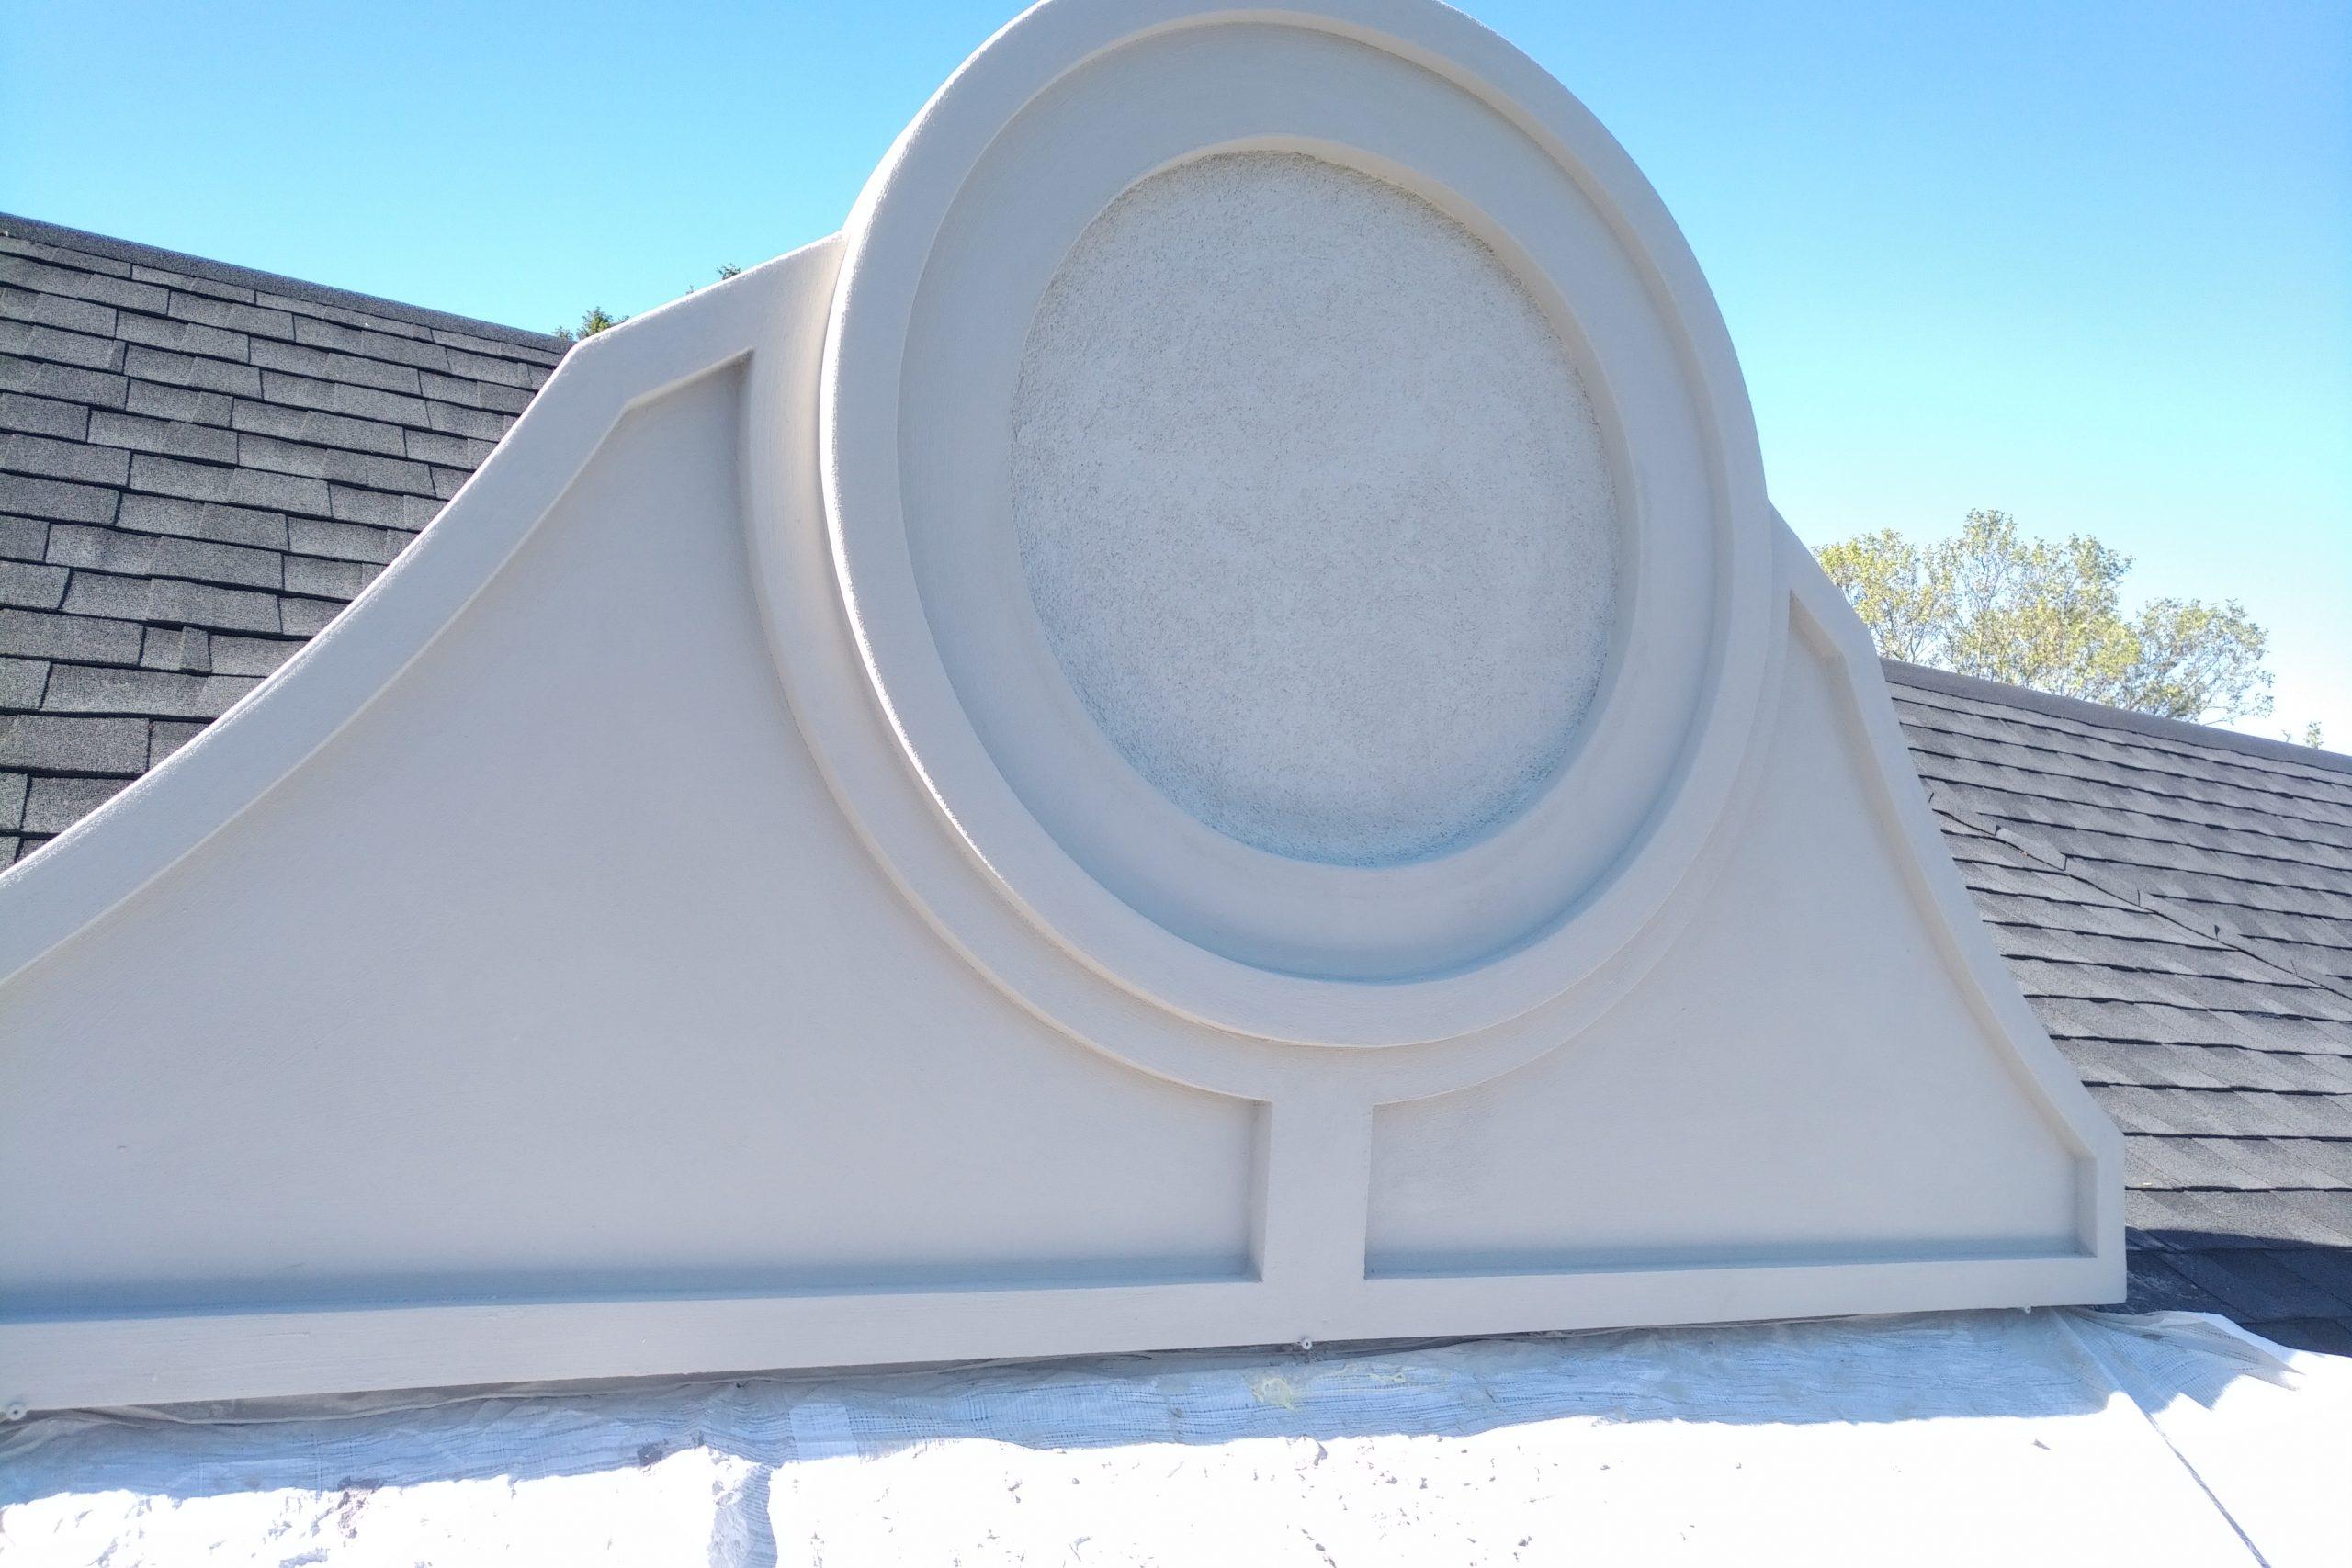 Sky-Stucco-systems-dormer-design-Mississauga-Brampton-milton-and-Toronto-GTA